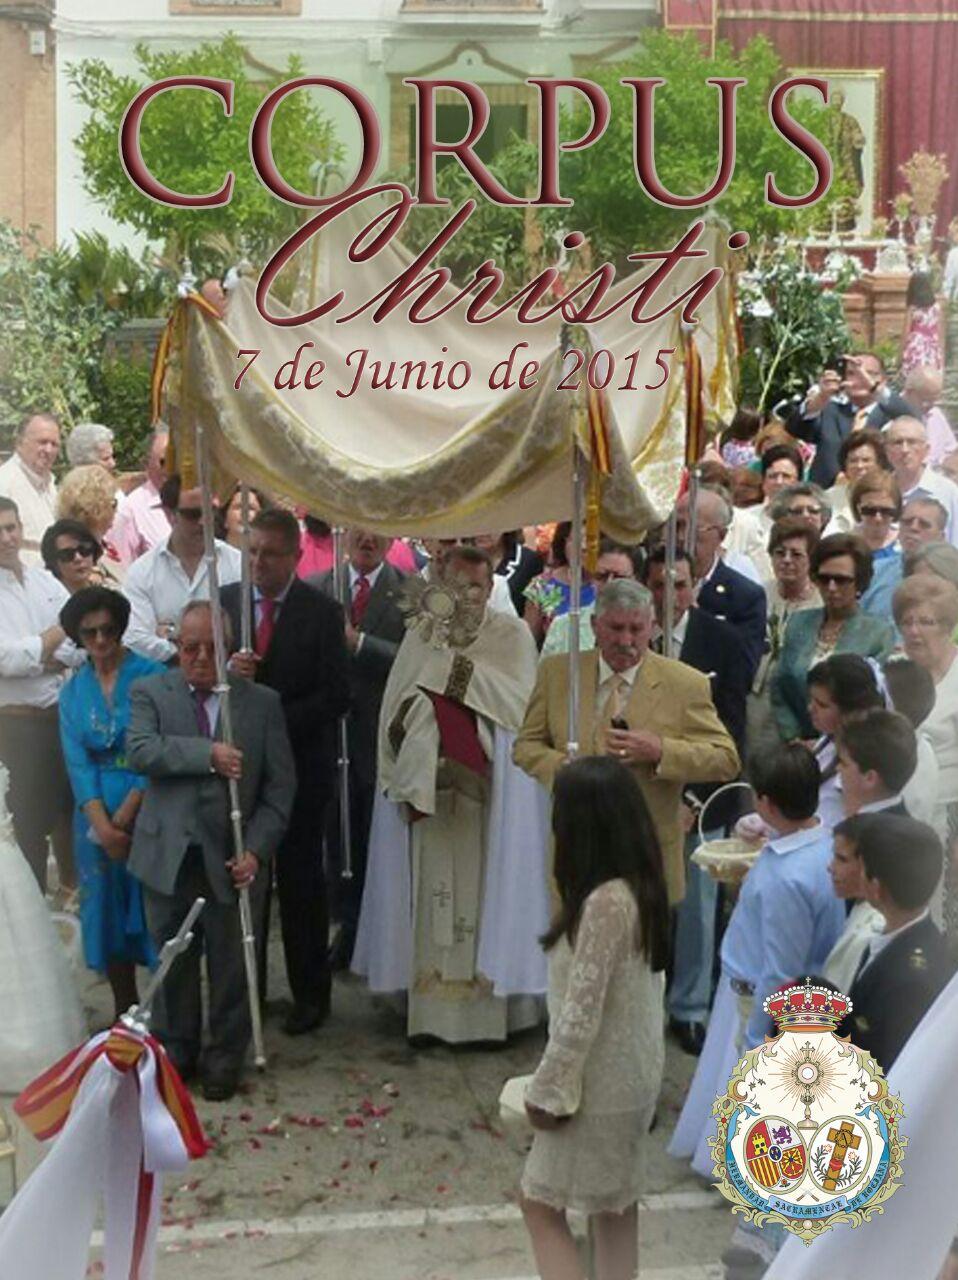 Fiesta del corpus christi 2015 aznalfarache for Azulejeria antigua cordoba